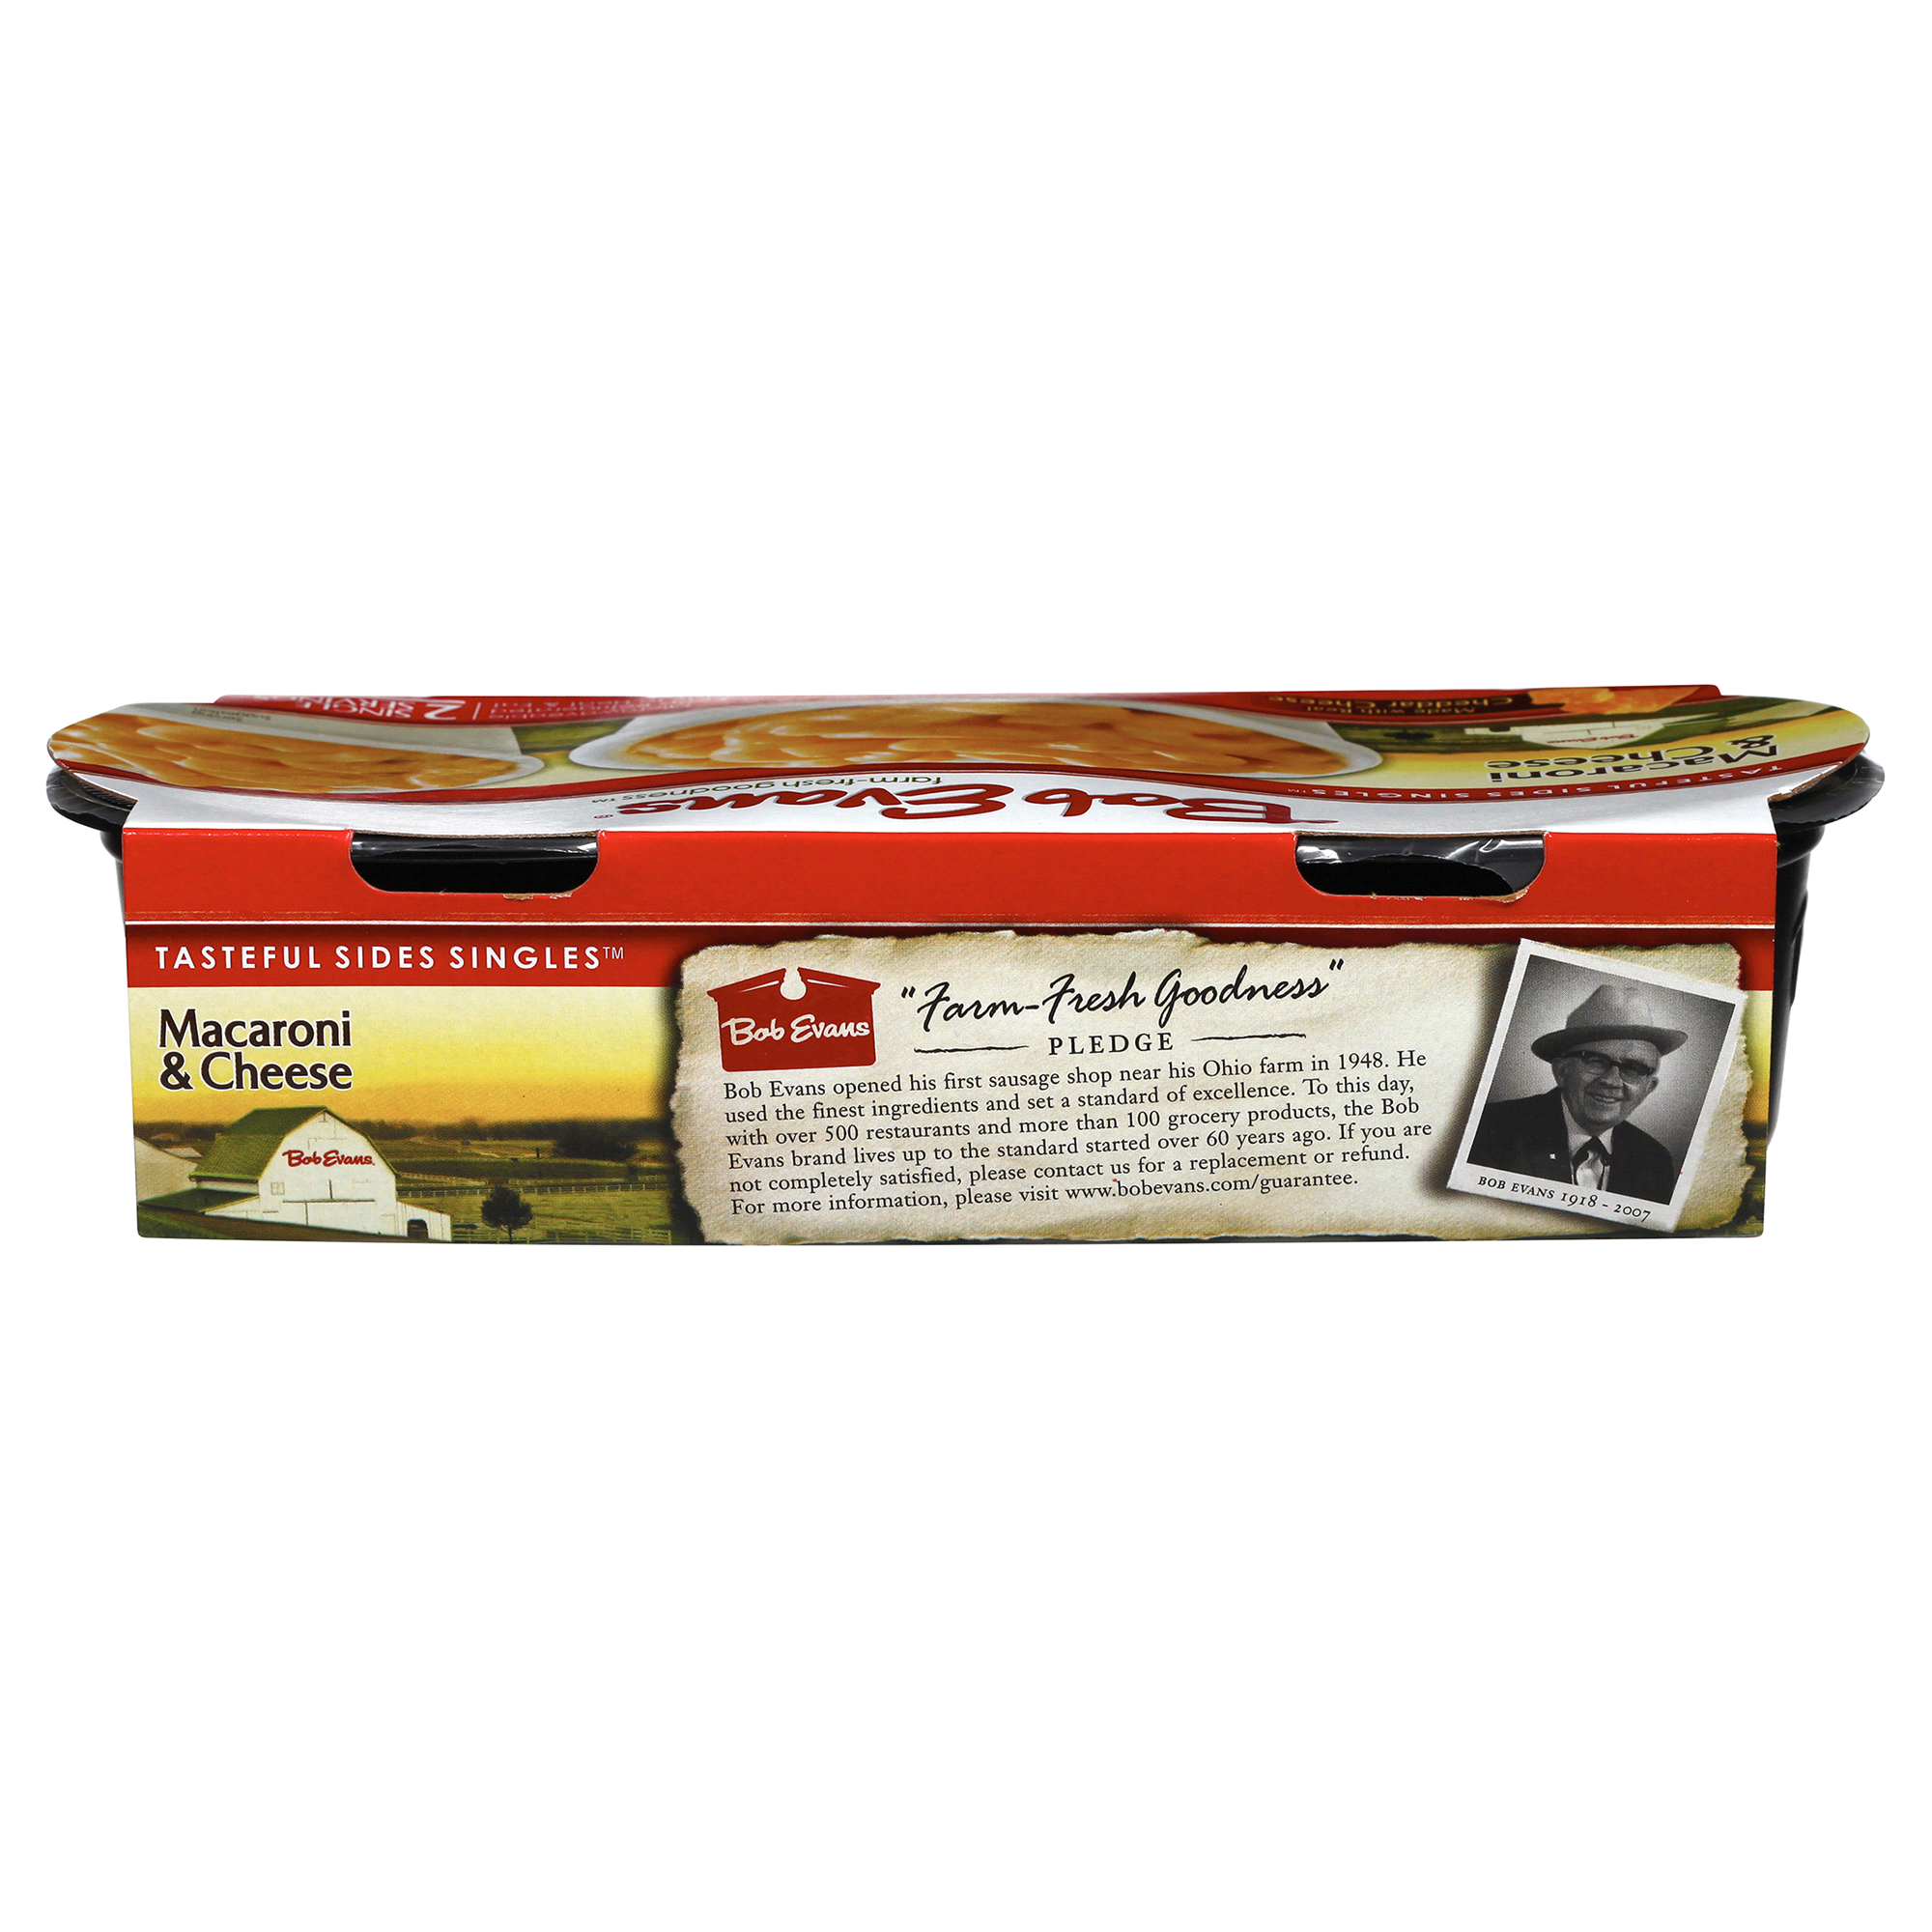 Bob Evans Tasteful Sides Singles Macaroni & Cheese 12 oz | Meijer.com